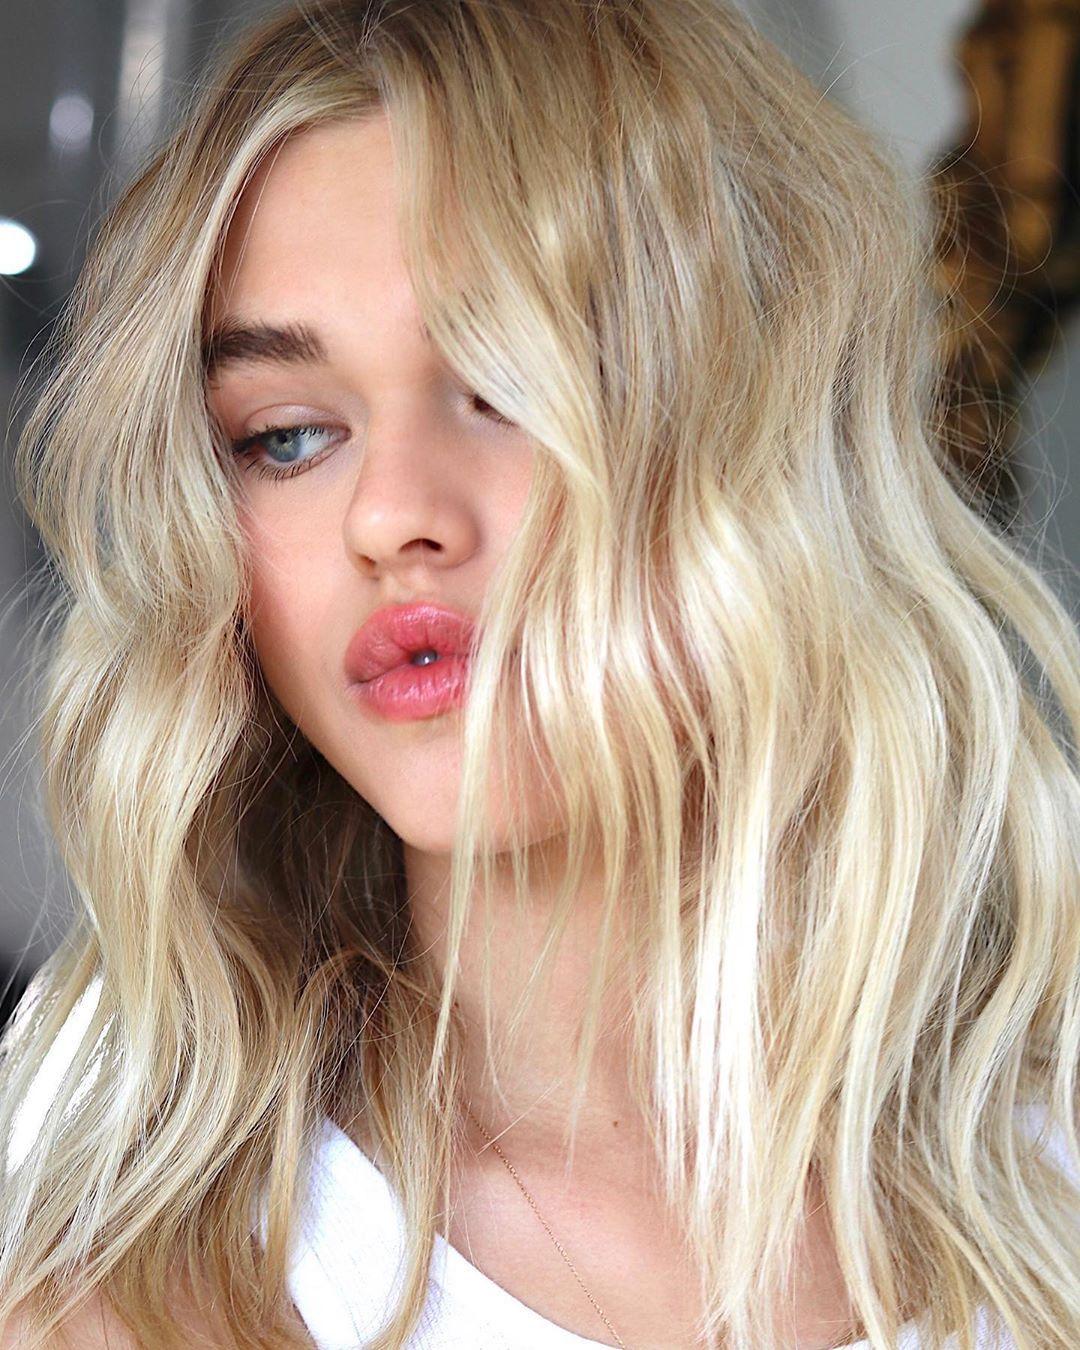 Beachwashed Hair Creator On Instagram Something About This Golden Balayage Give Meeeeeeeee Vibessss Kenraprofessional Makes A In 2020 Global Hair Balayage Hair